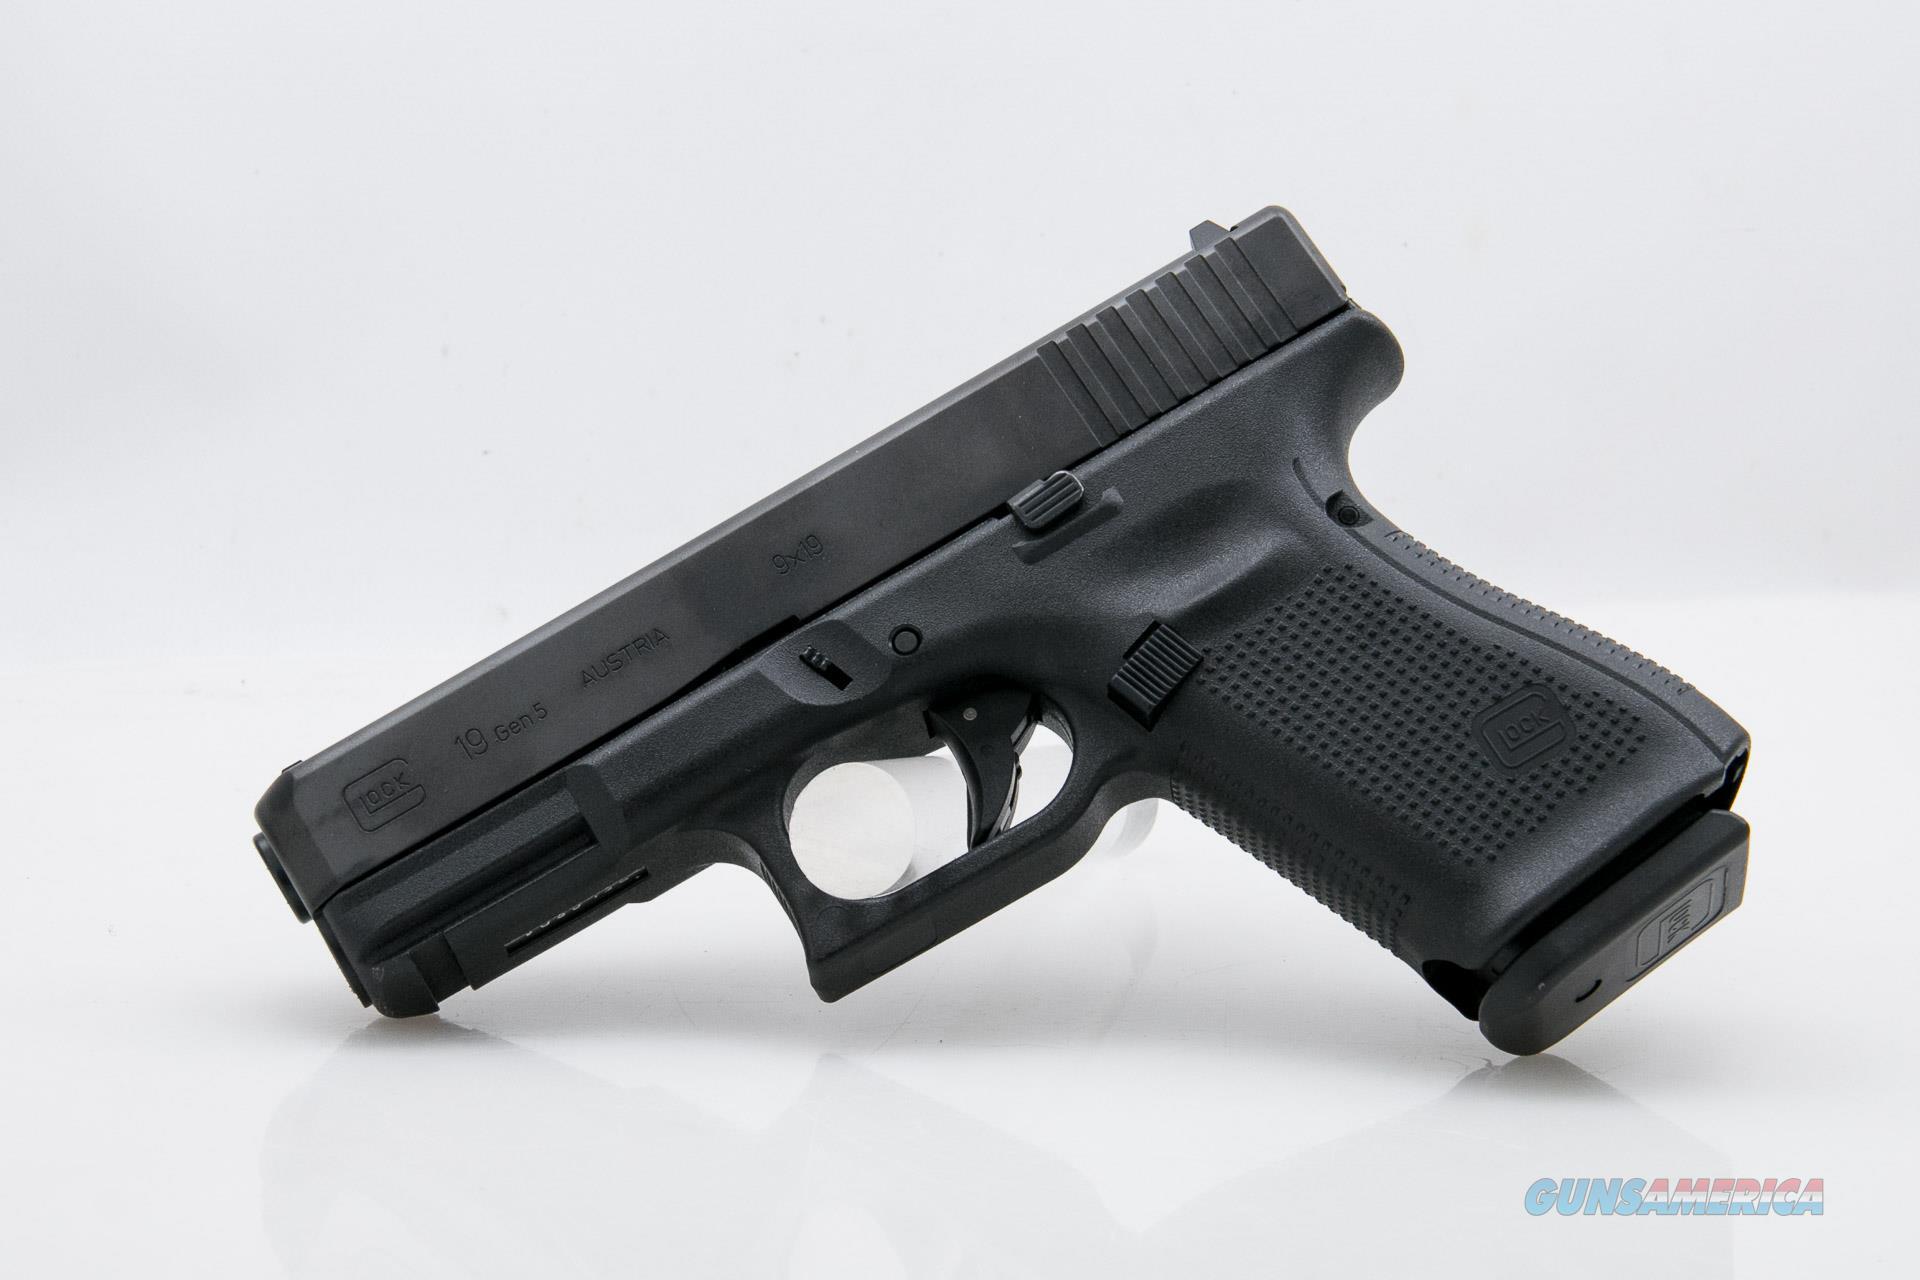 Glock 19 Generation 5 MOS, 9mm NEW PA195S203MOS  Guns > Pistols > Glock Pistols > 19/19X